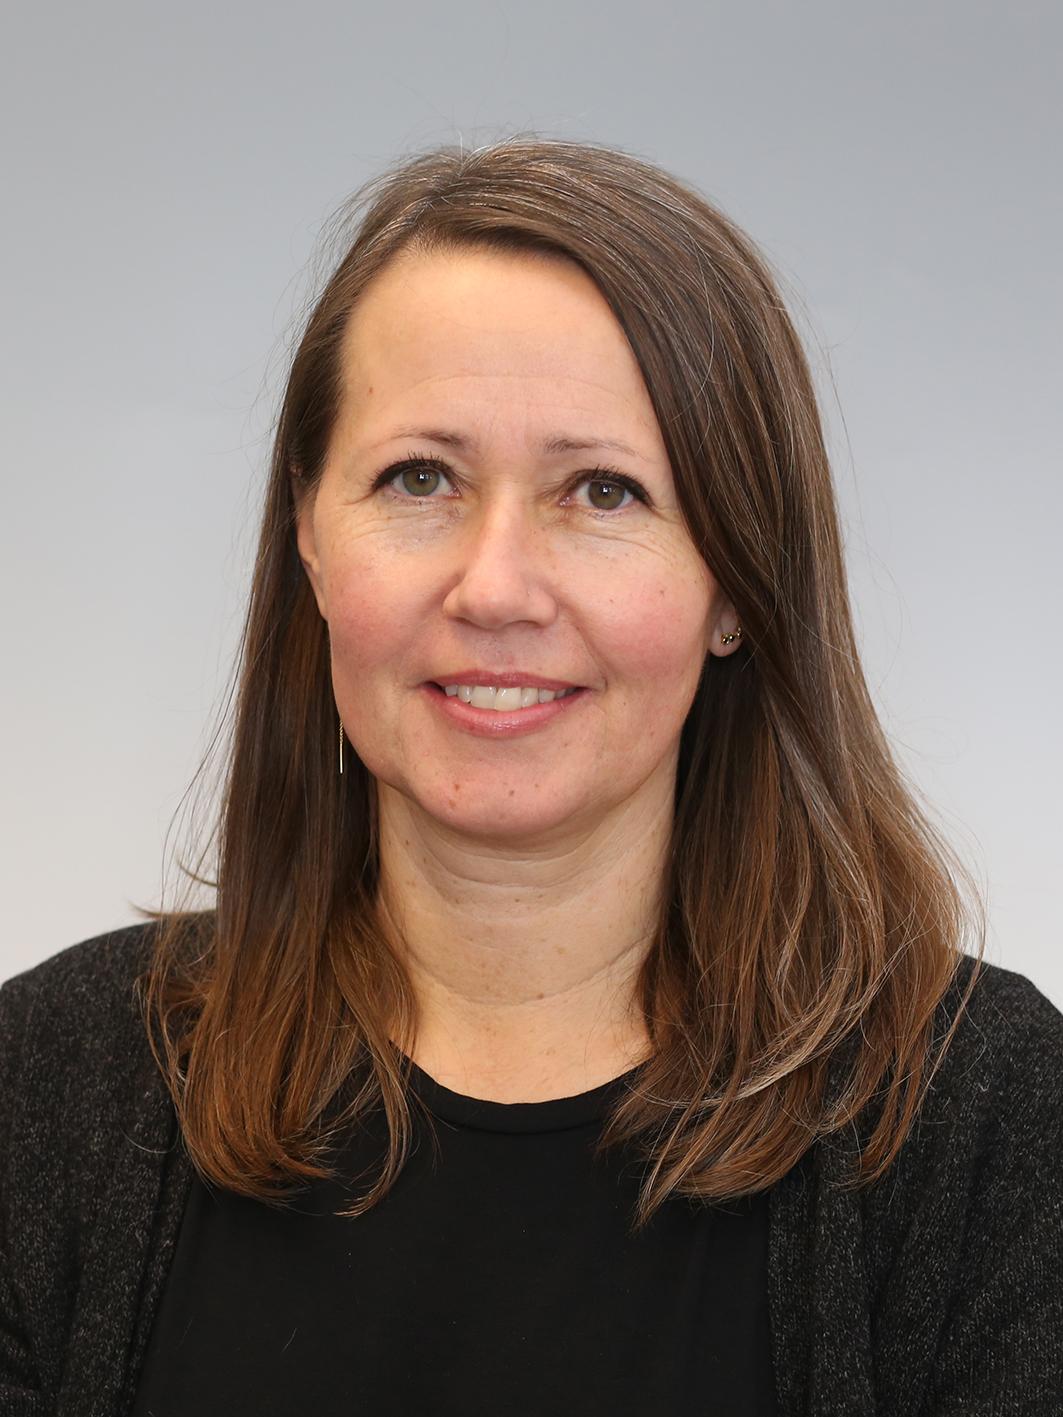 Heidi Eskegaard Jensen